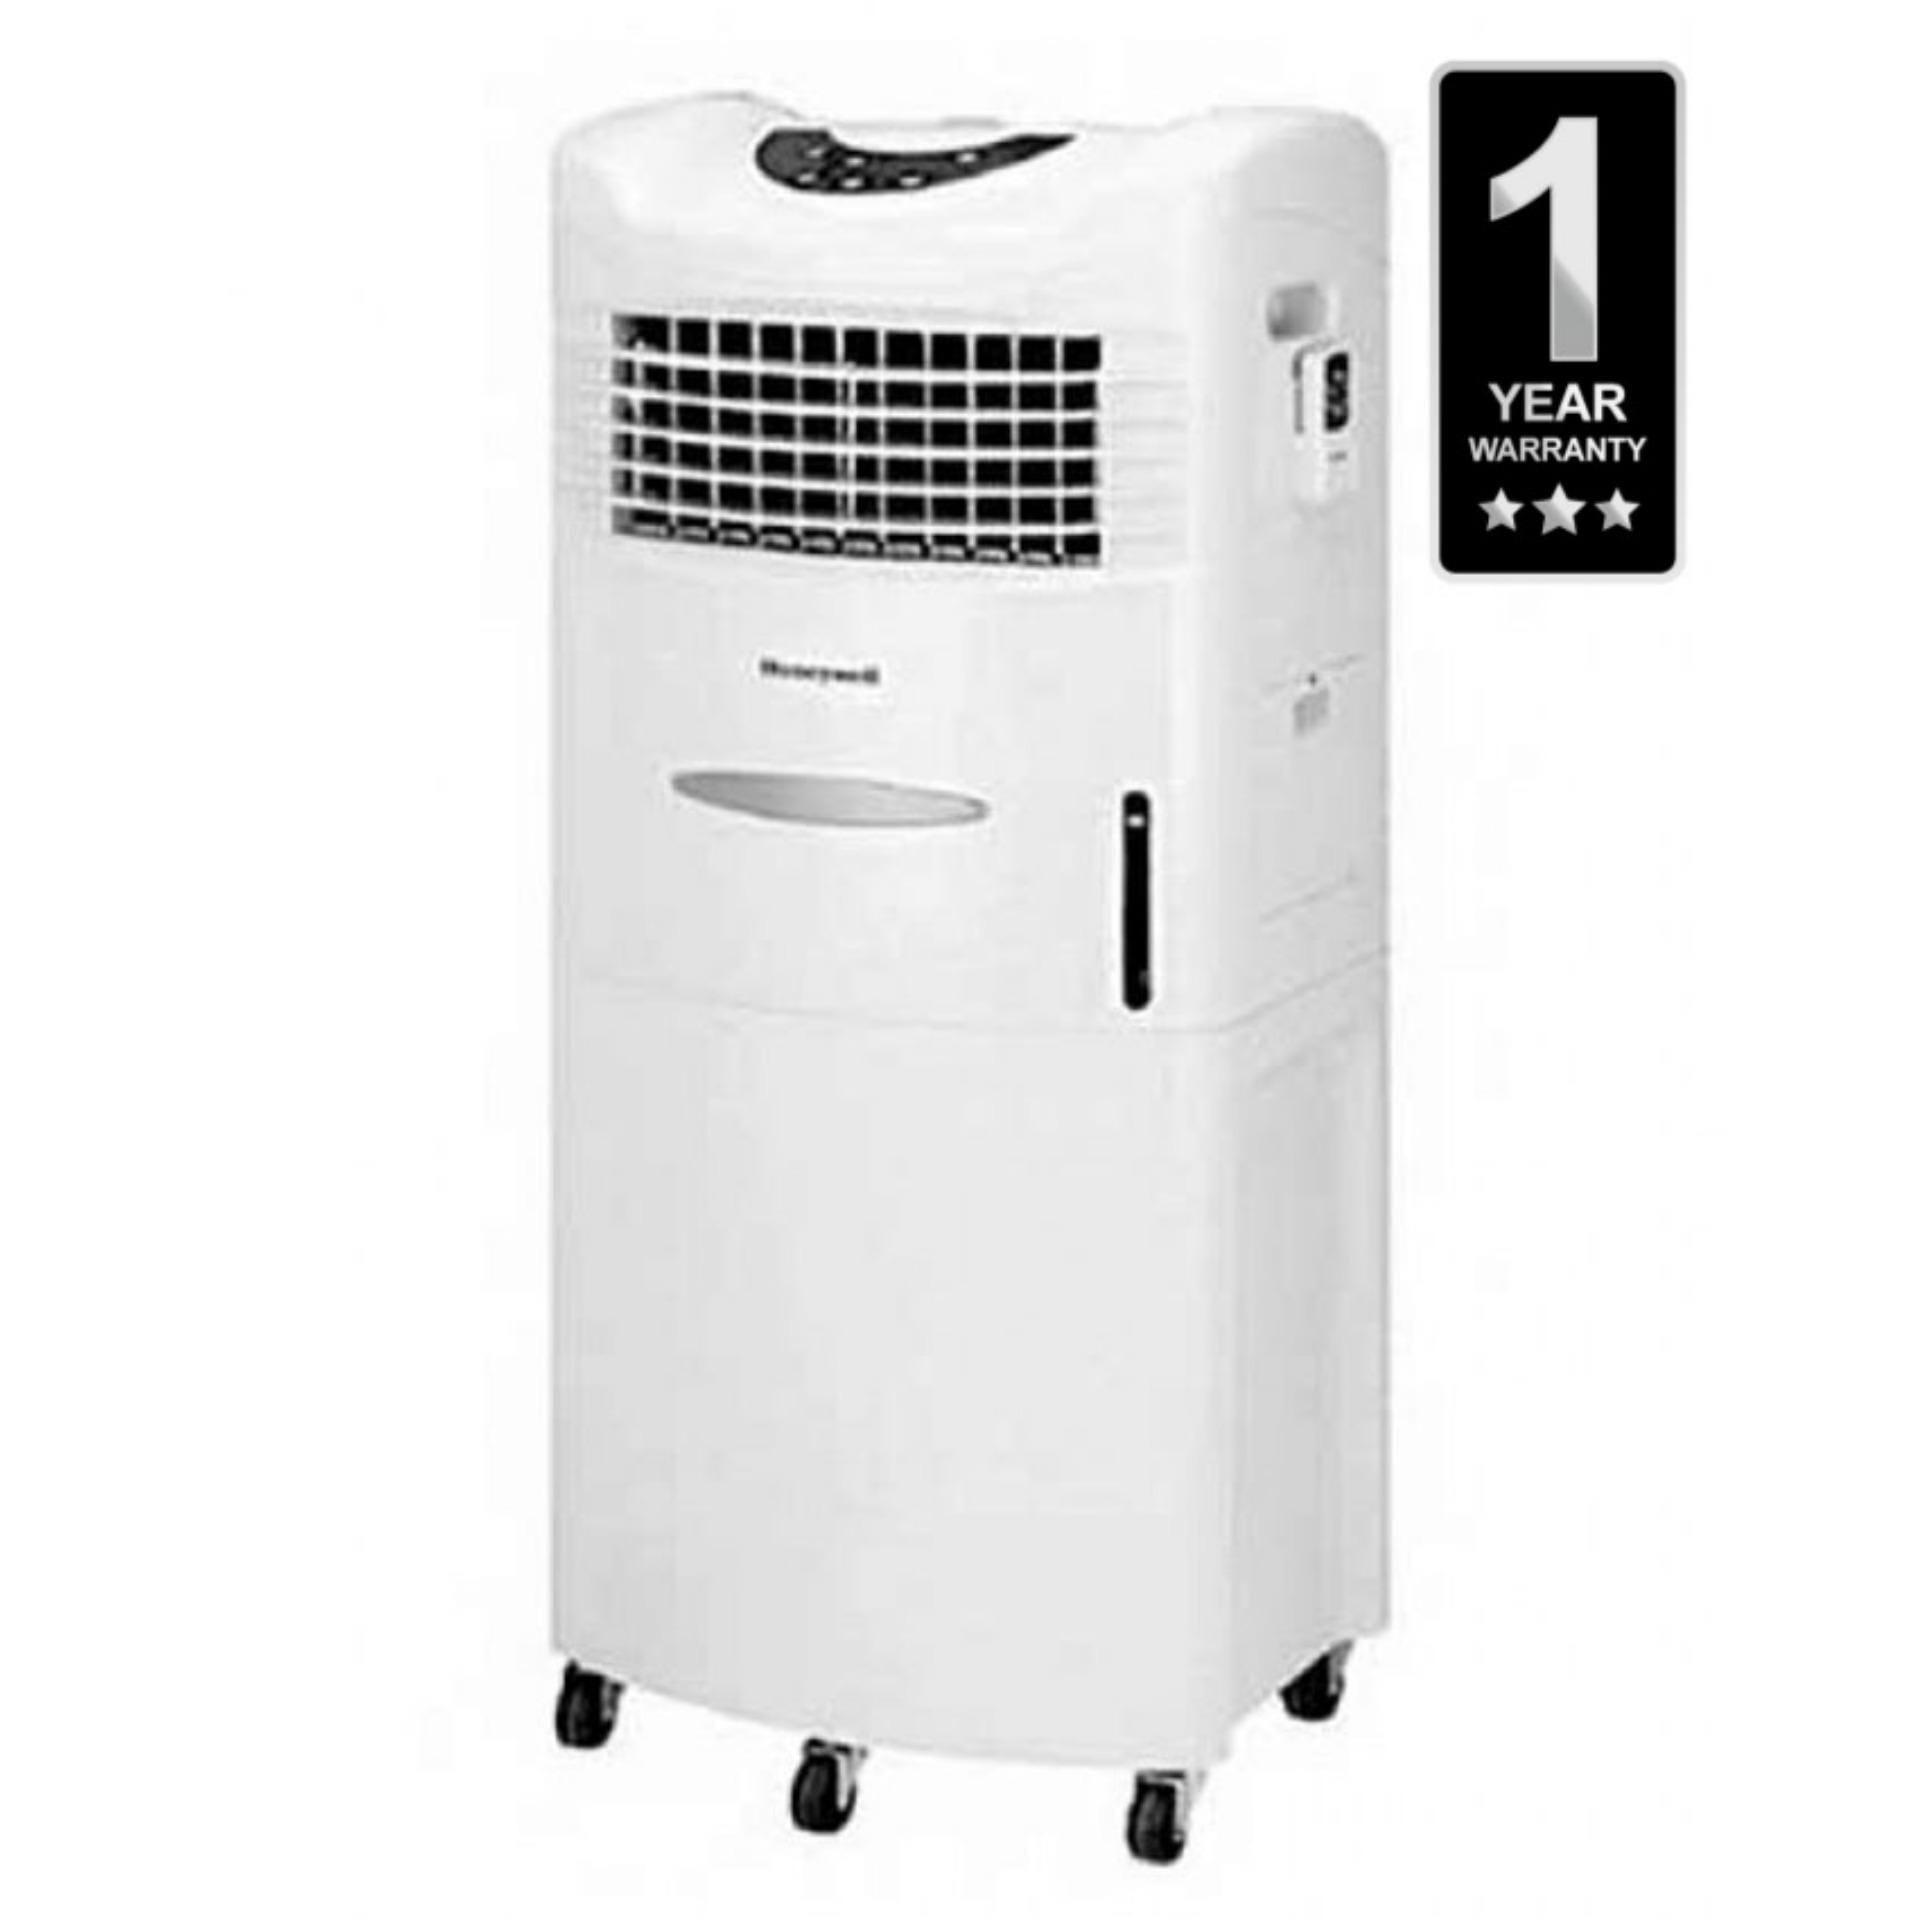 Honeywell Air Room Cooler - White - CL 604 AE